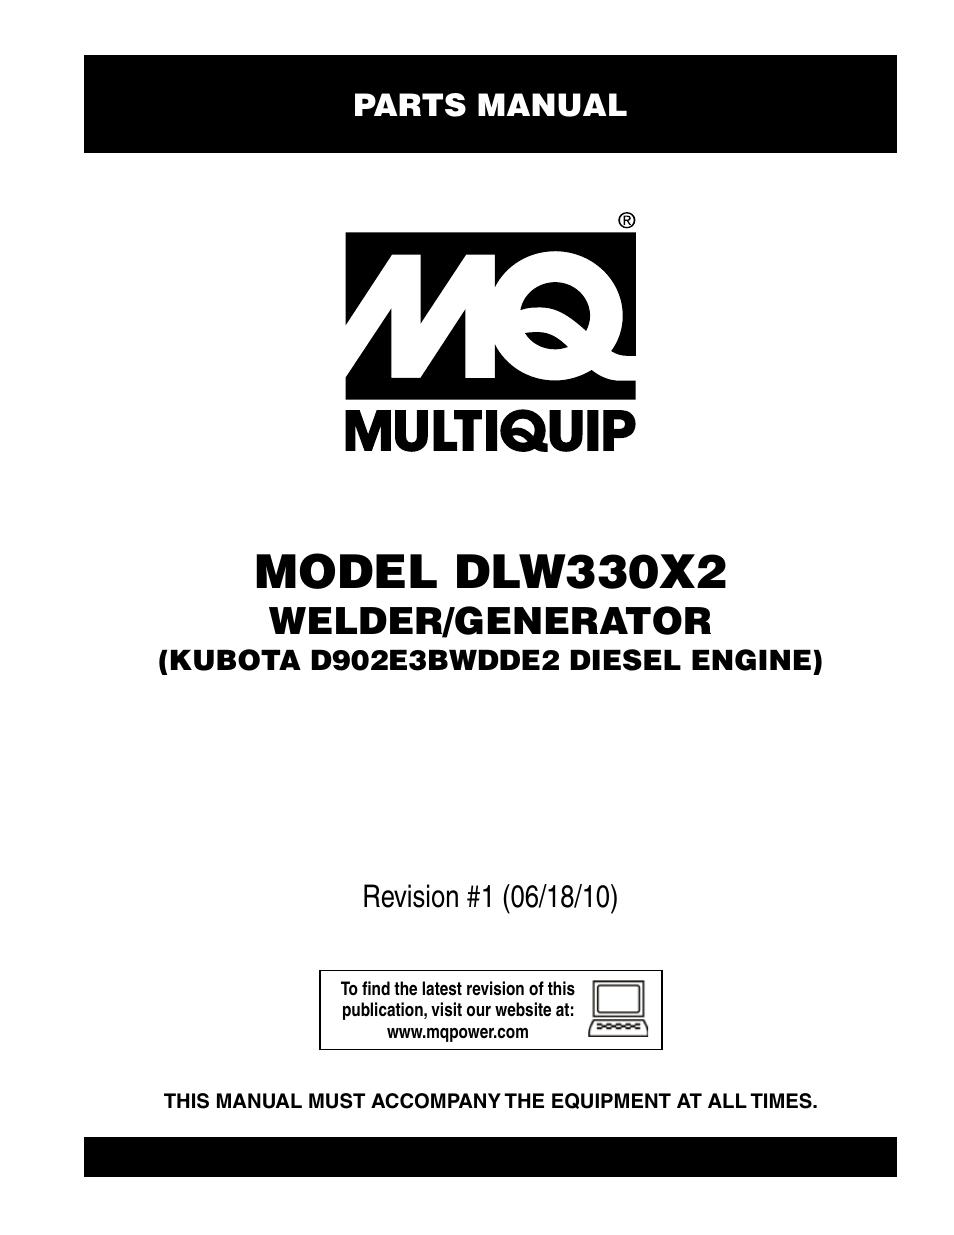 multiquip welder  generator  kubota d902e3bwdde2 diesel